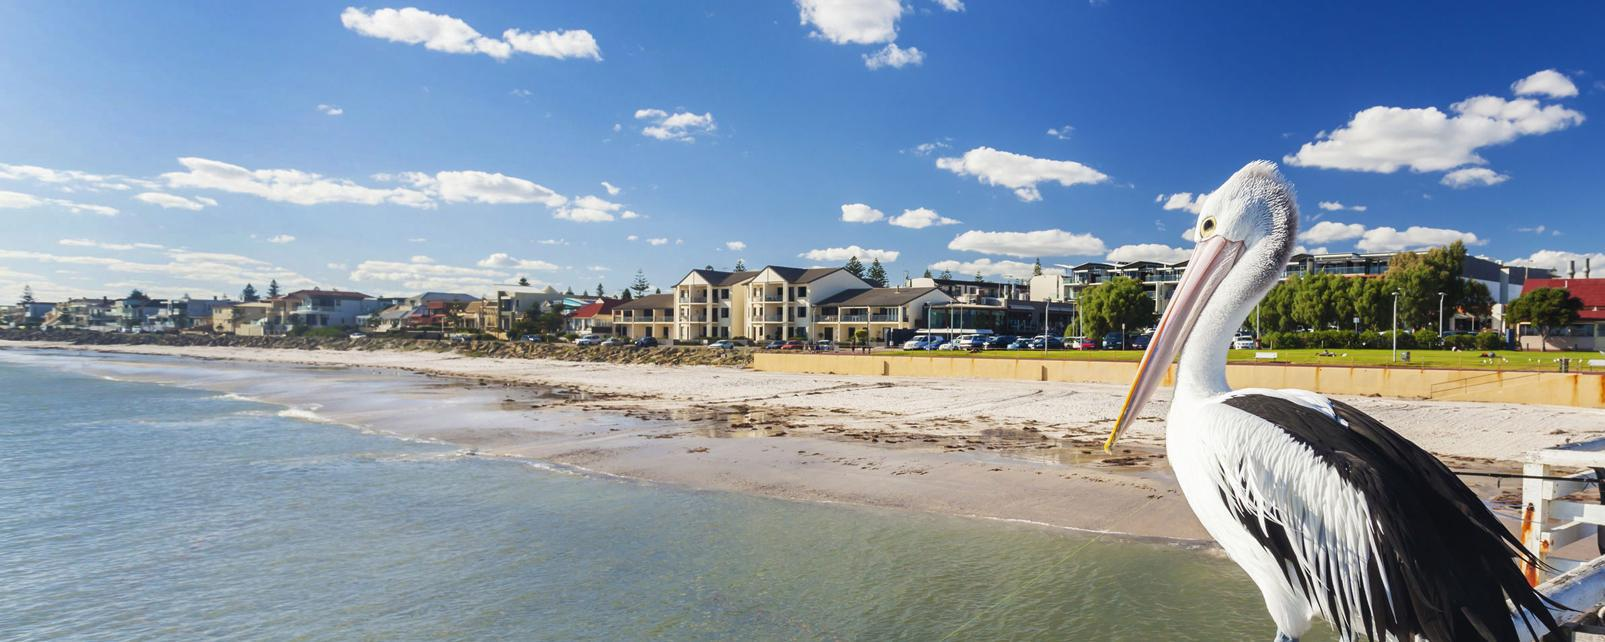 Océanie; Australie; Adelaide;